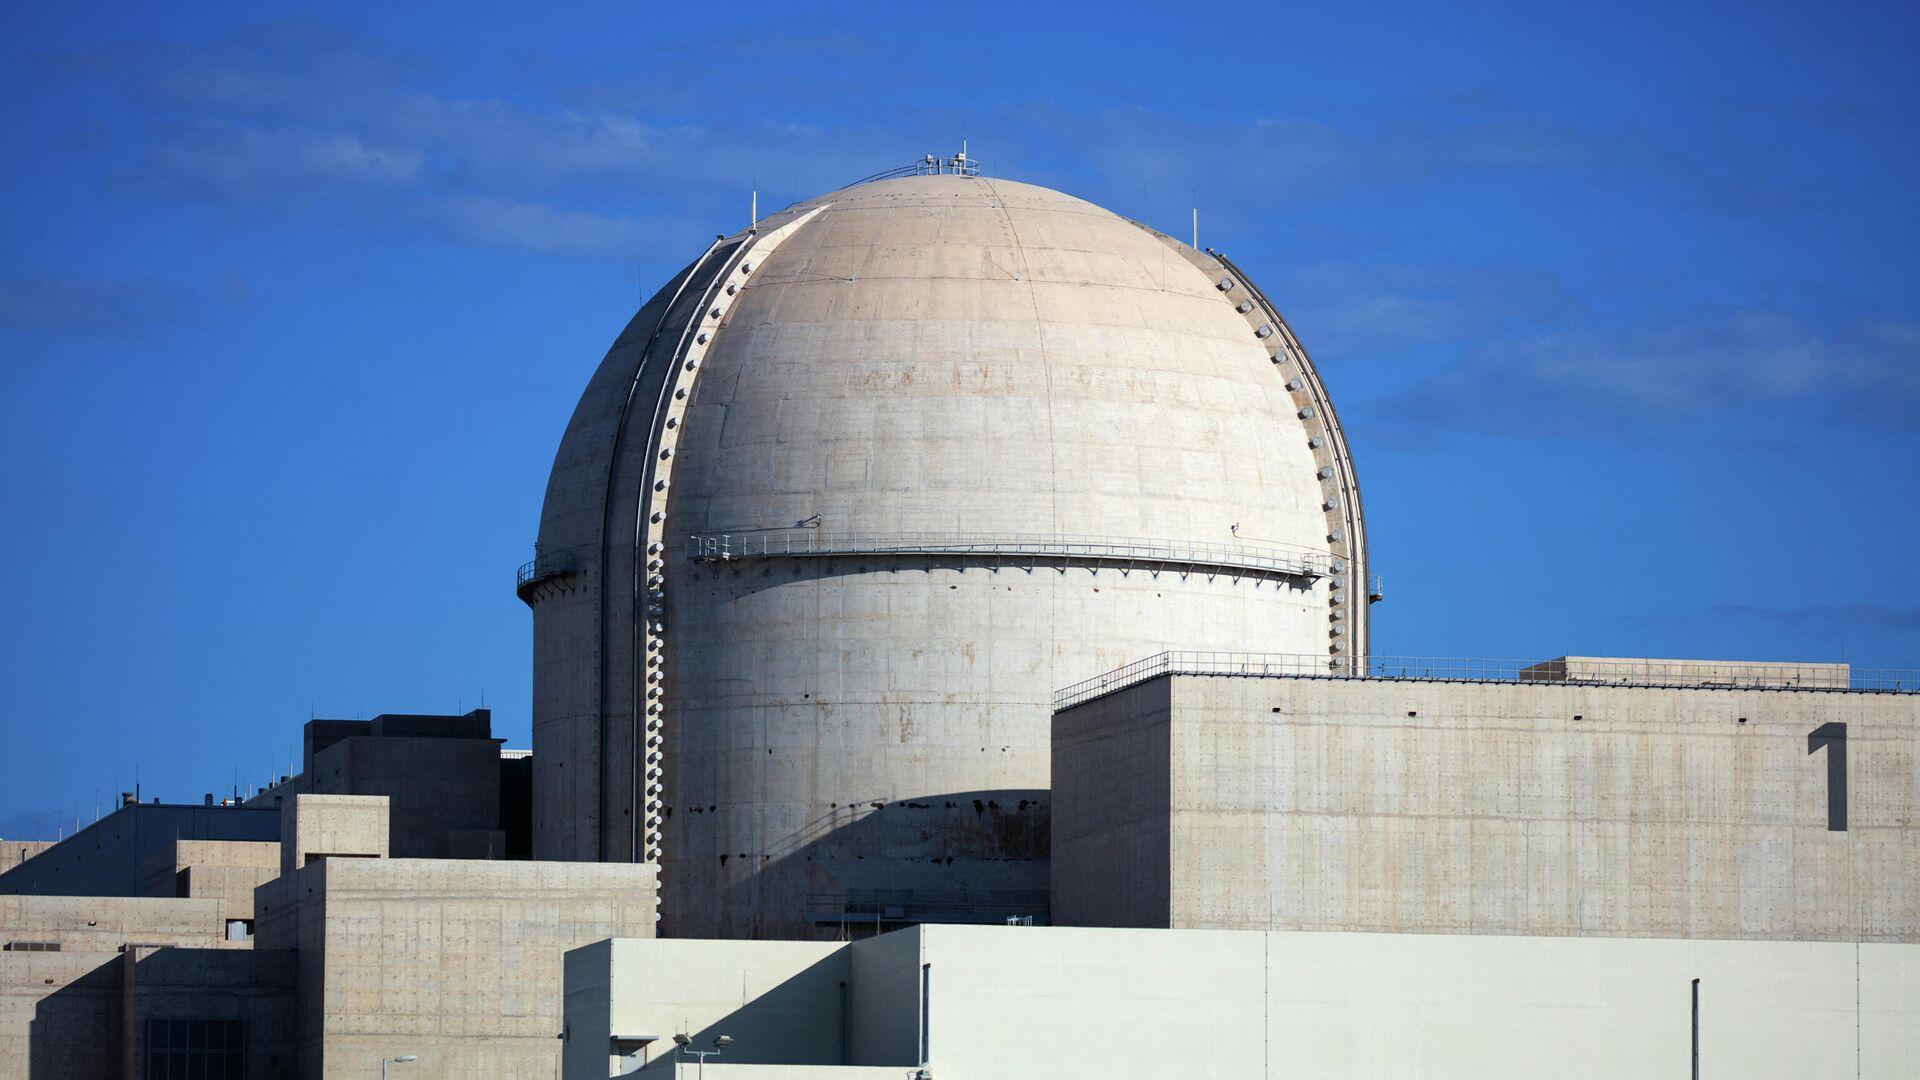 Primera planta nuclear de EAU en la localidad de Barakah - Sputnik Mundo, 1920, 27.08.2021